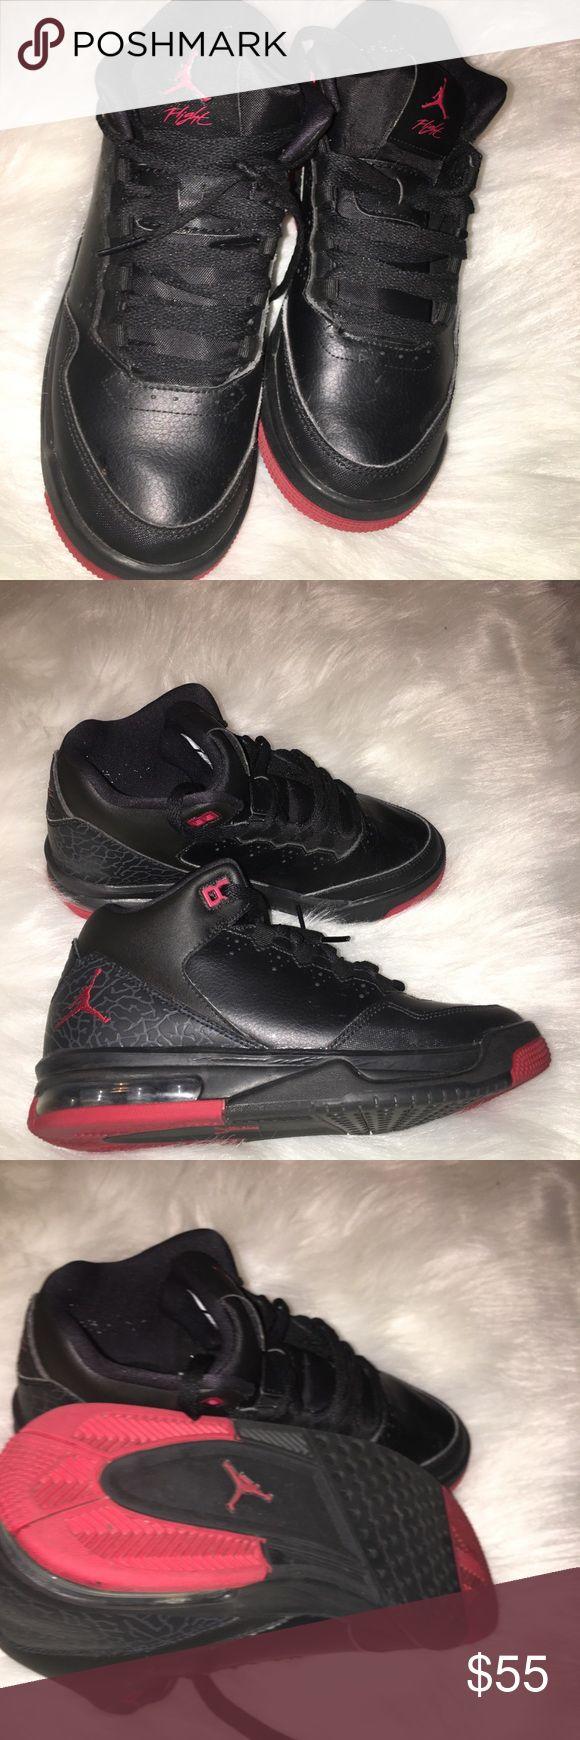 Jordan Air Flights, 5.5 Boys Great condition Black/red boys grade school Jordan, great condition! Jordan Shoes Sneakers